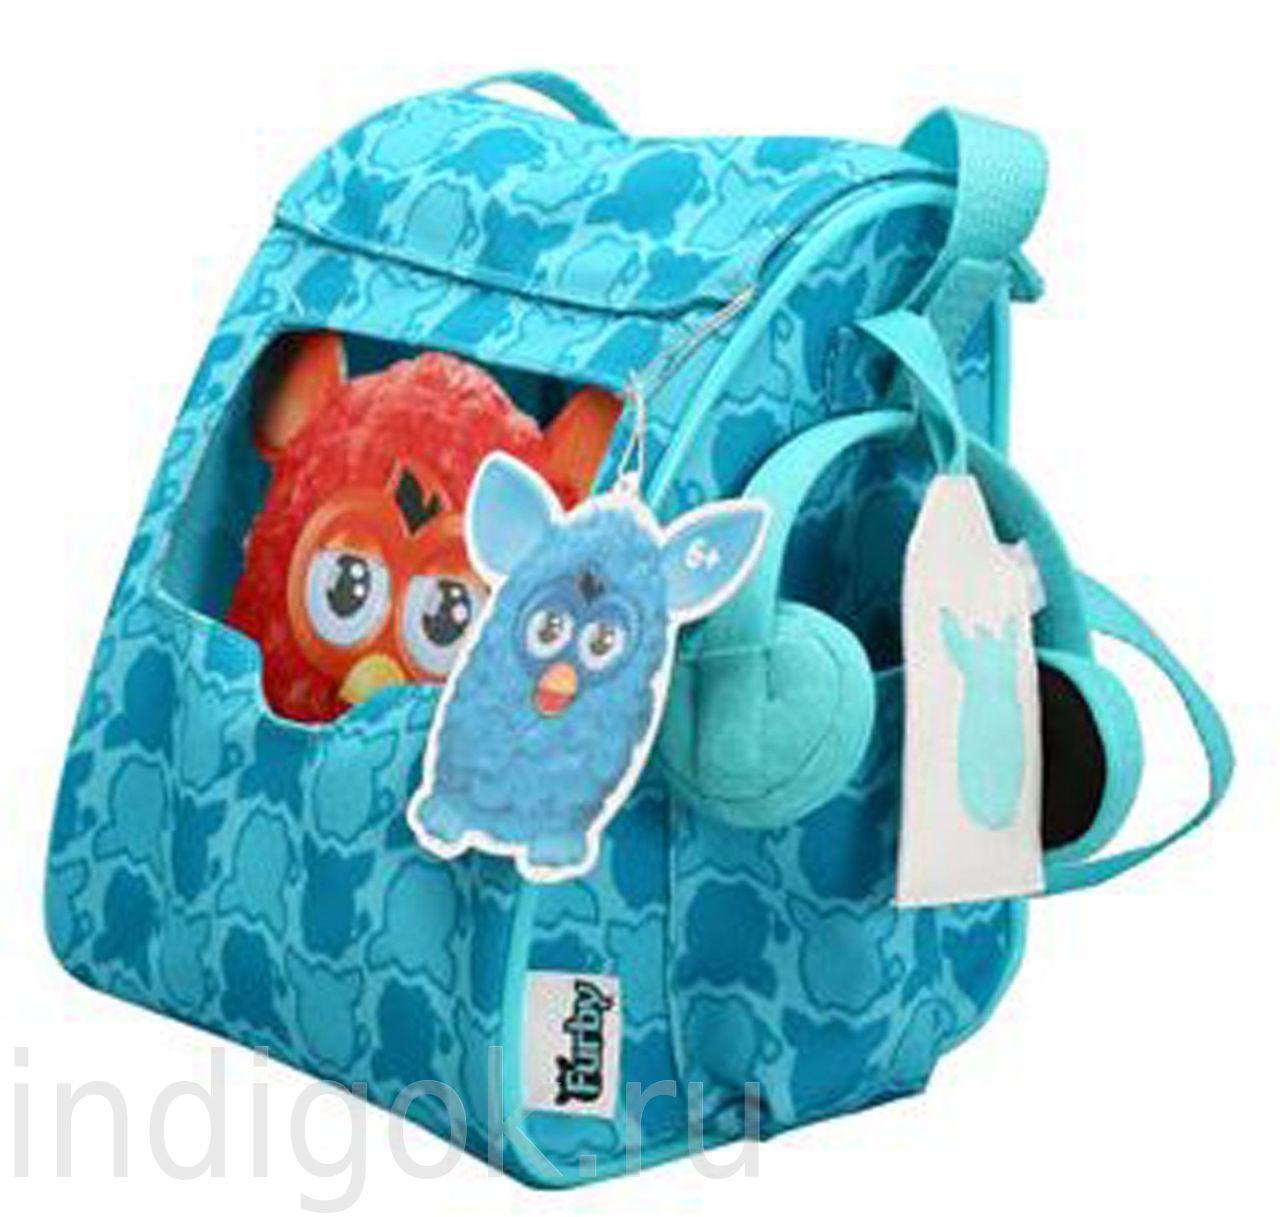 Furby Fashion Carrier Sling Bag Exclusive Teal - сумка-рюкзак для ферби.